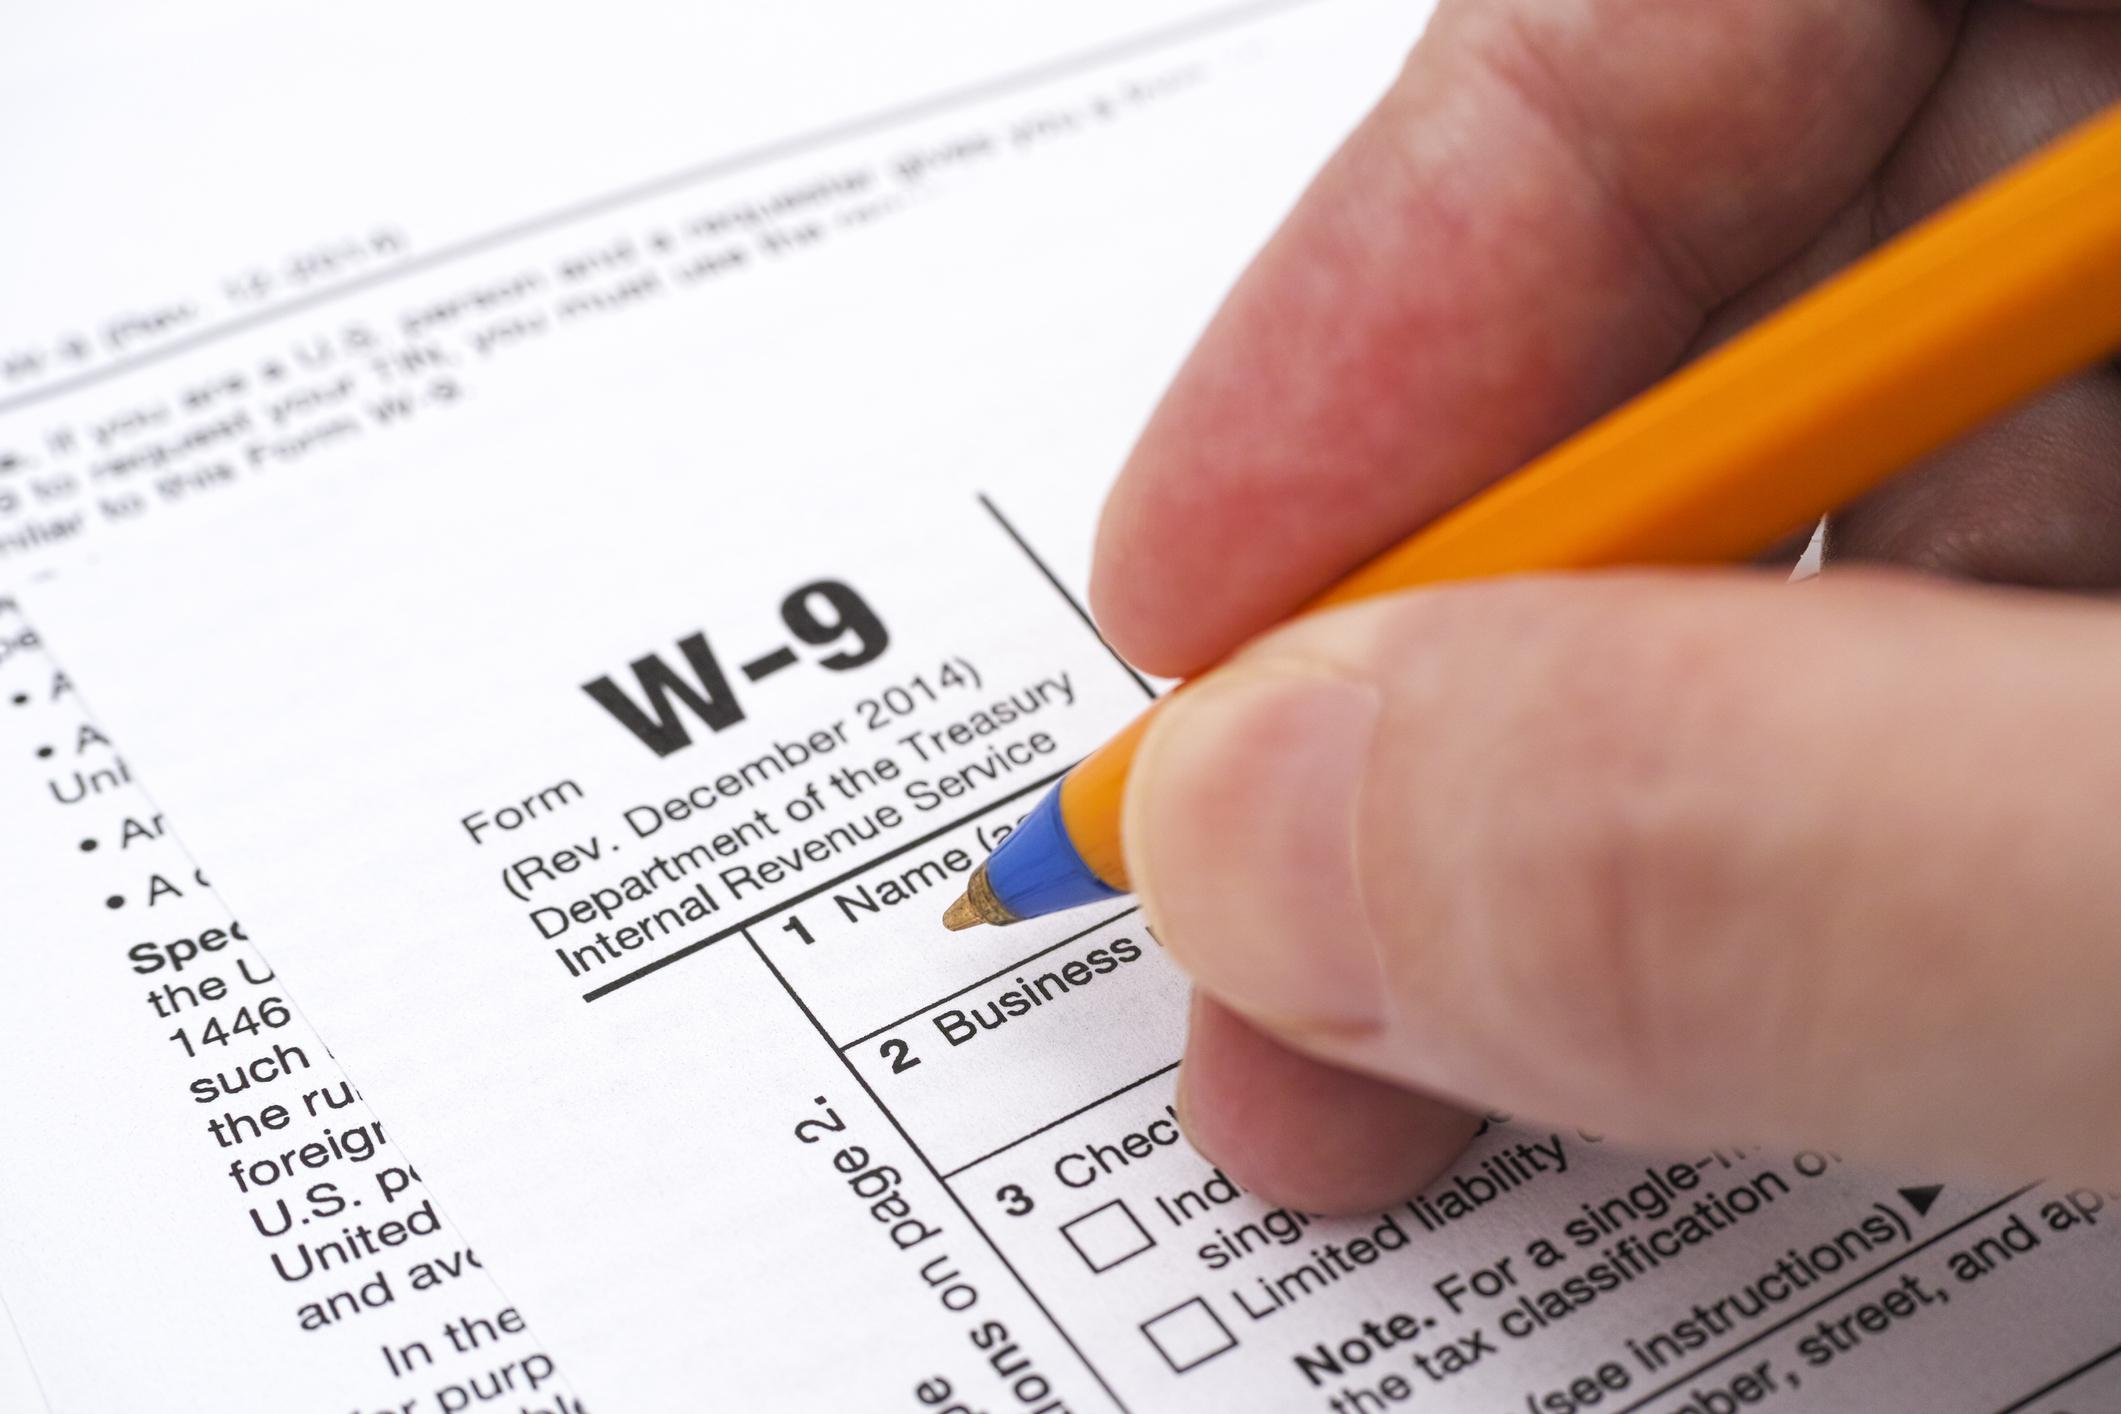 I 9 Form 2021 Printable | Calendar Template Printable pertaining to I-9 Form 2021 Printable Form